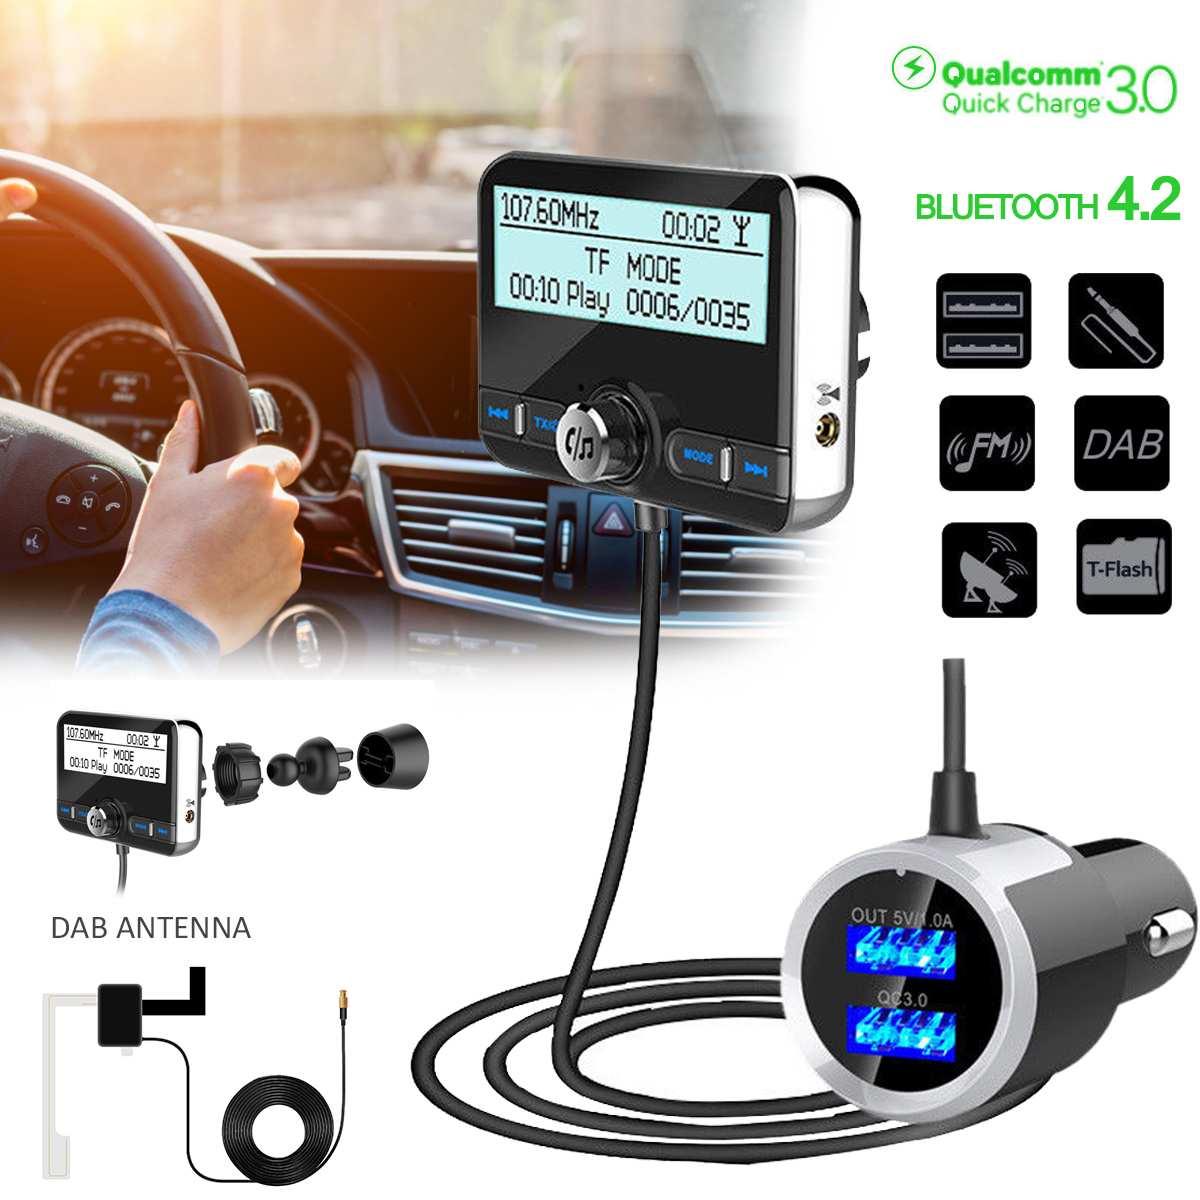 Car DAB Radio Receiver Tuner USB Adapter bluetooth Car Transmitter TF AUX Antenna LCD Display Digital